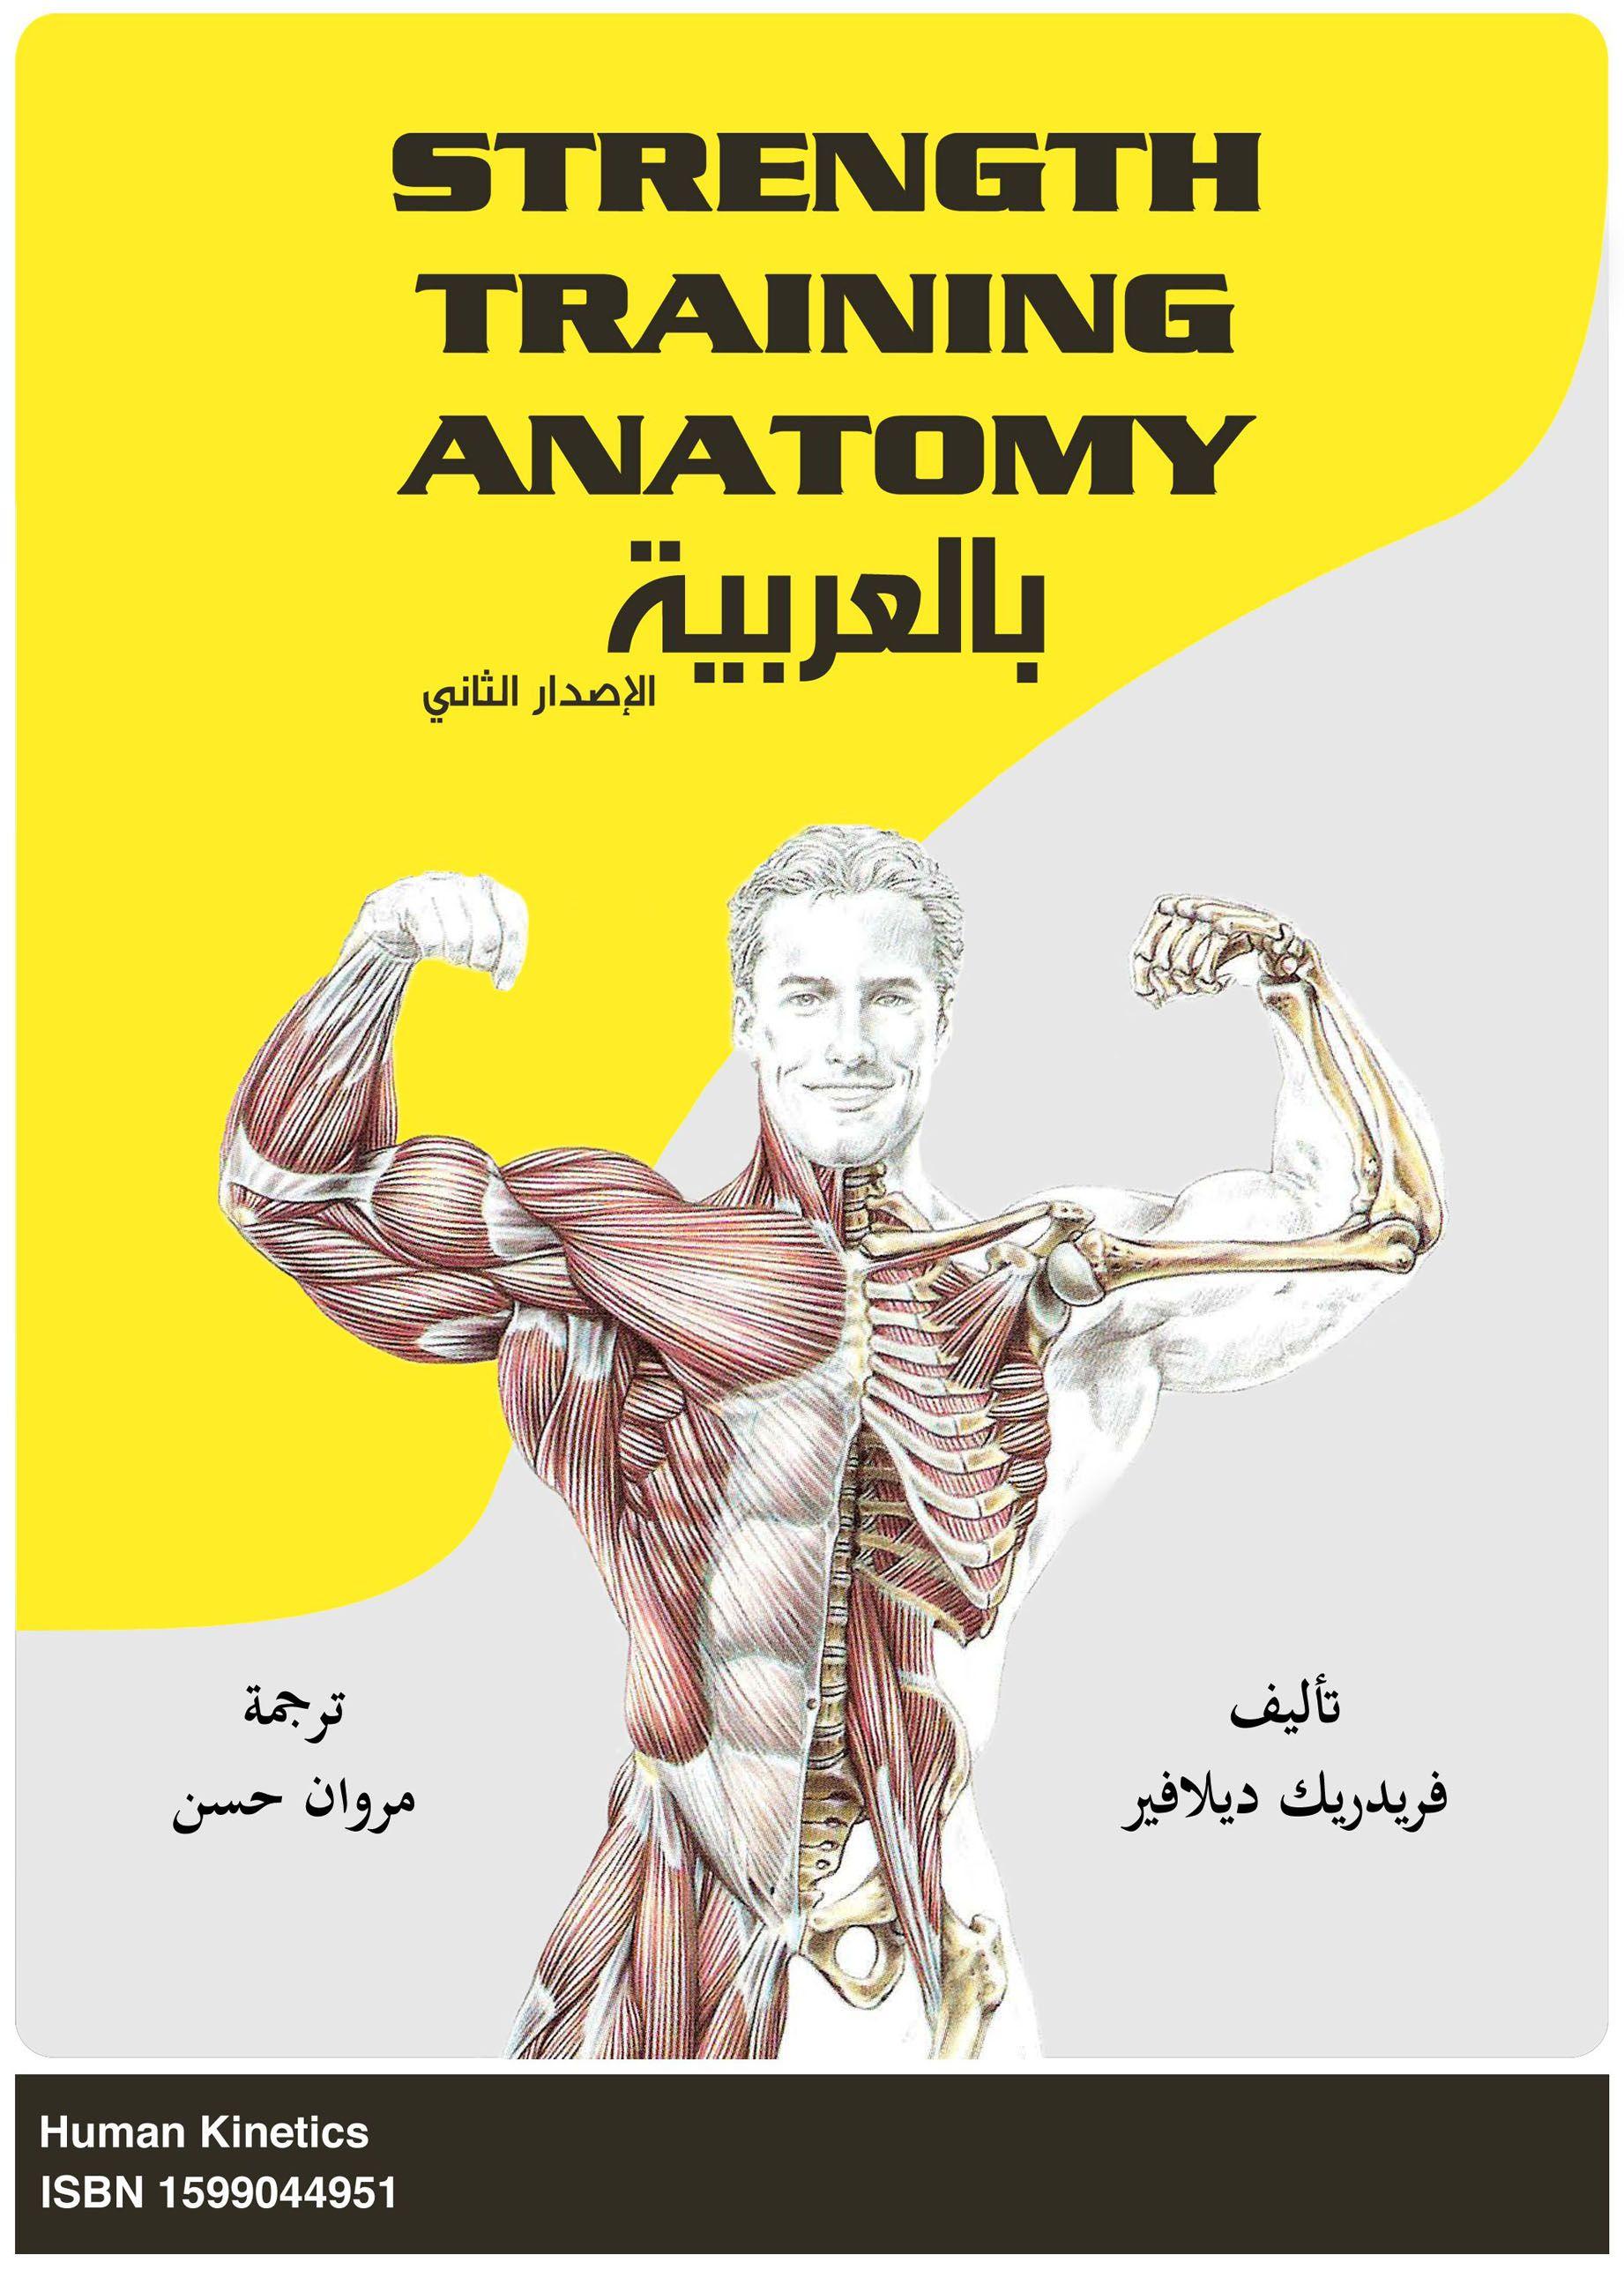 Frederic delavier strength training anatomy free pdf